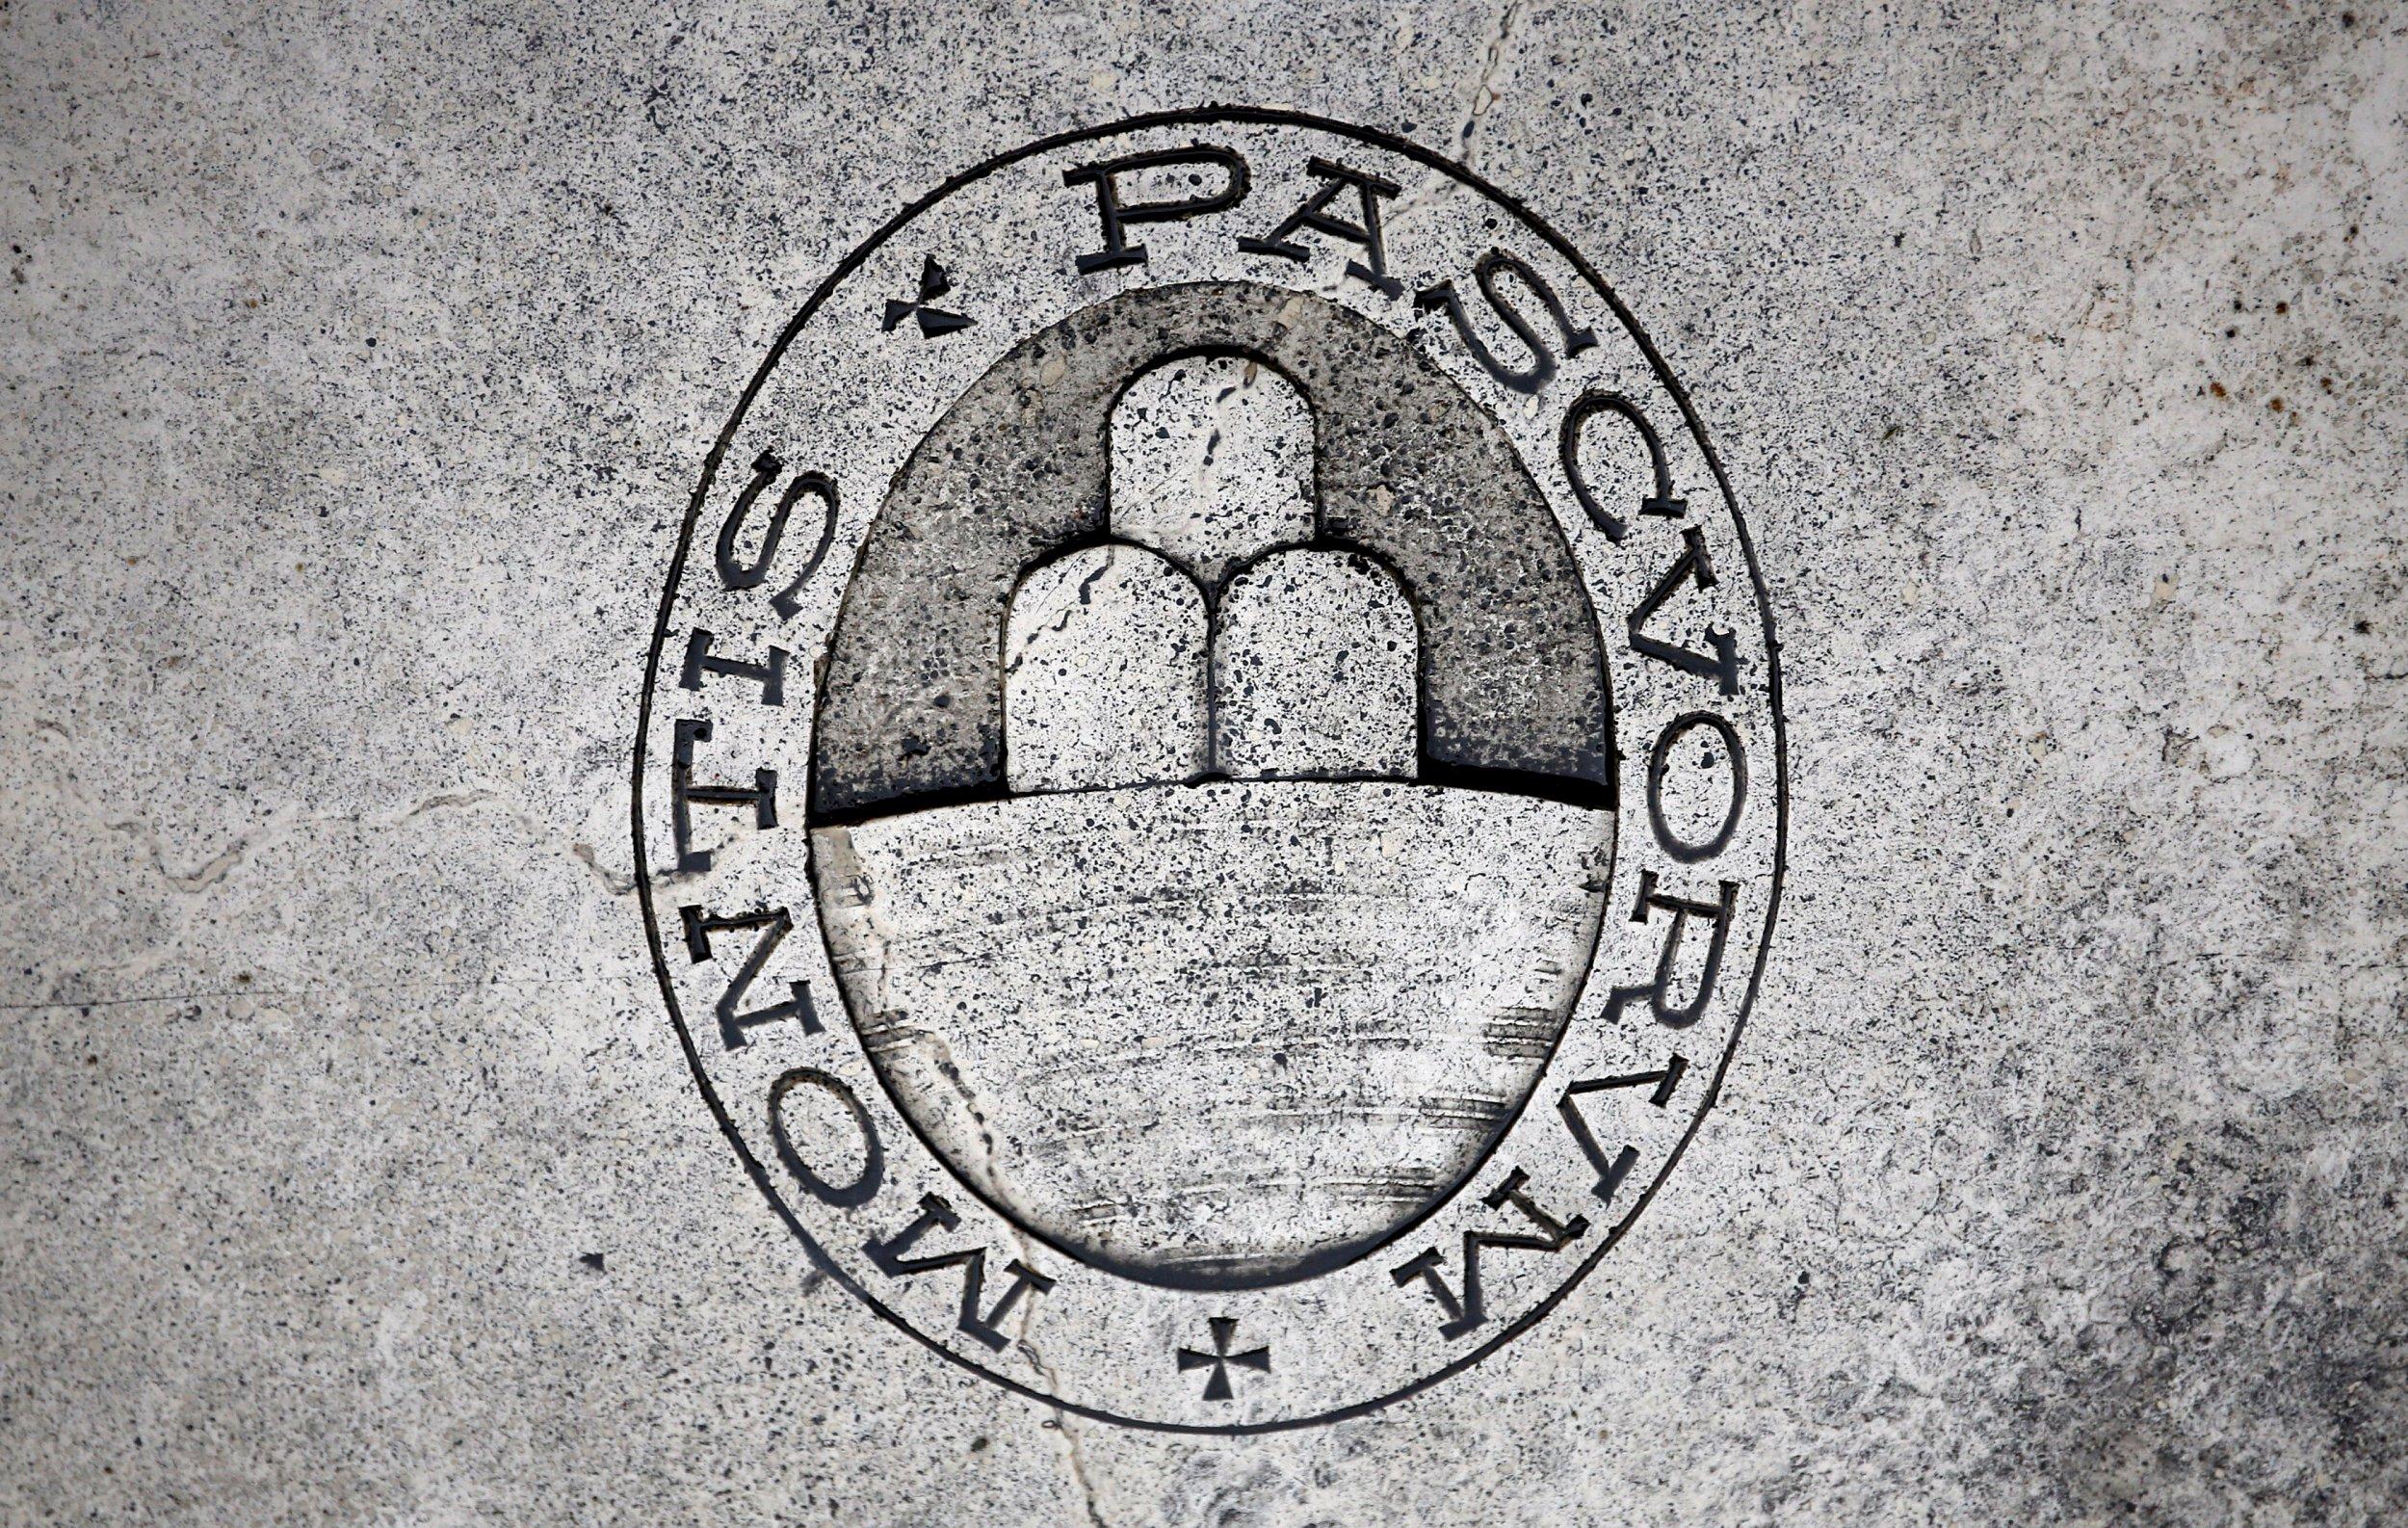 A logo of Monte dei Paschi di Siena bank